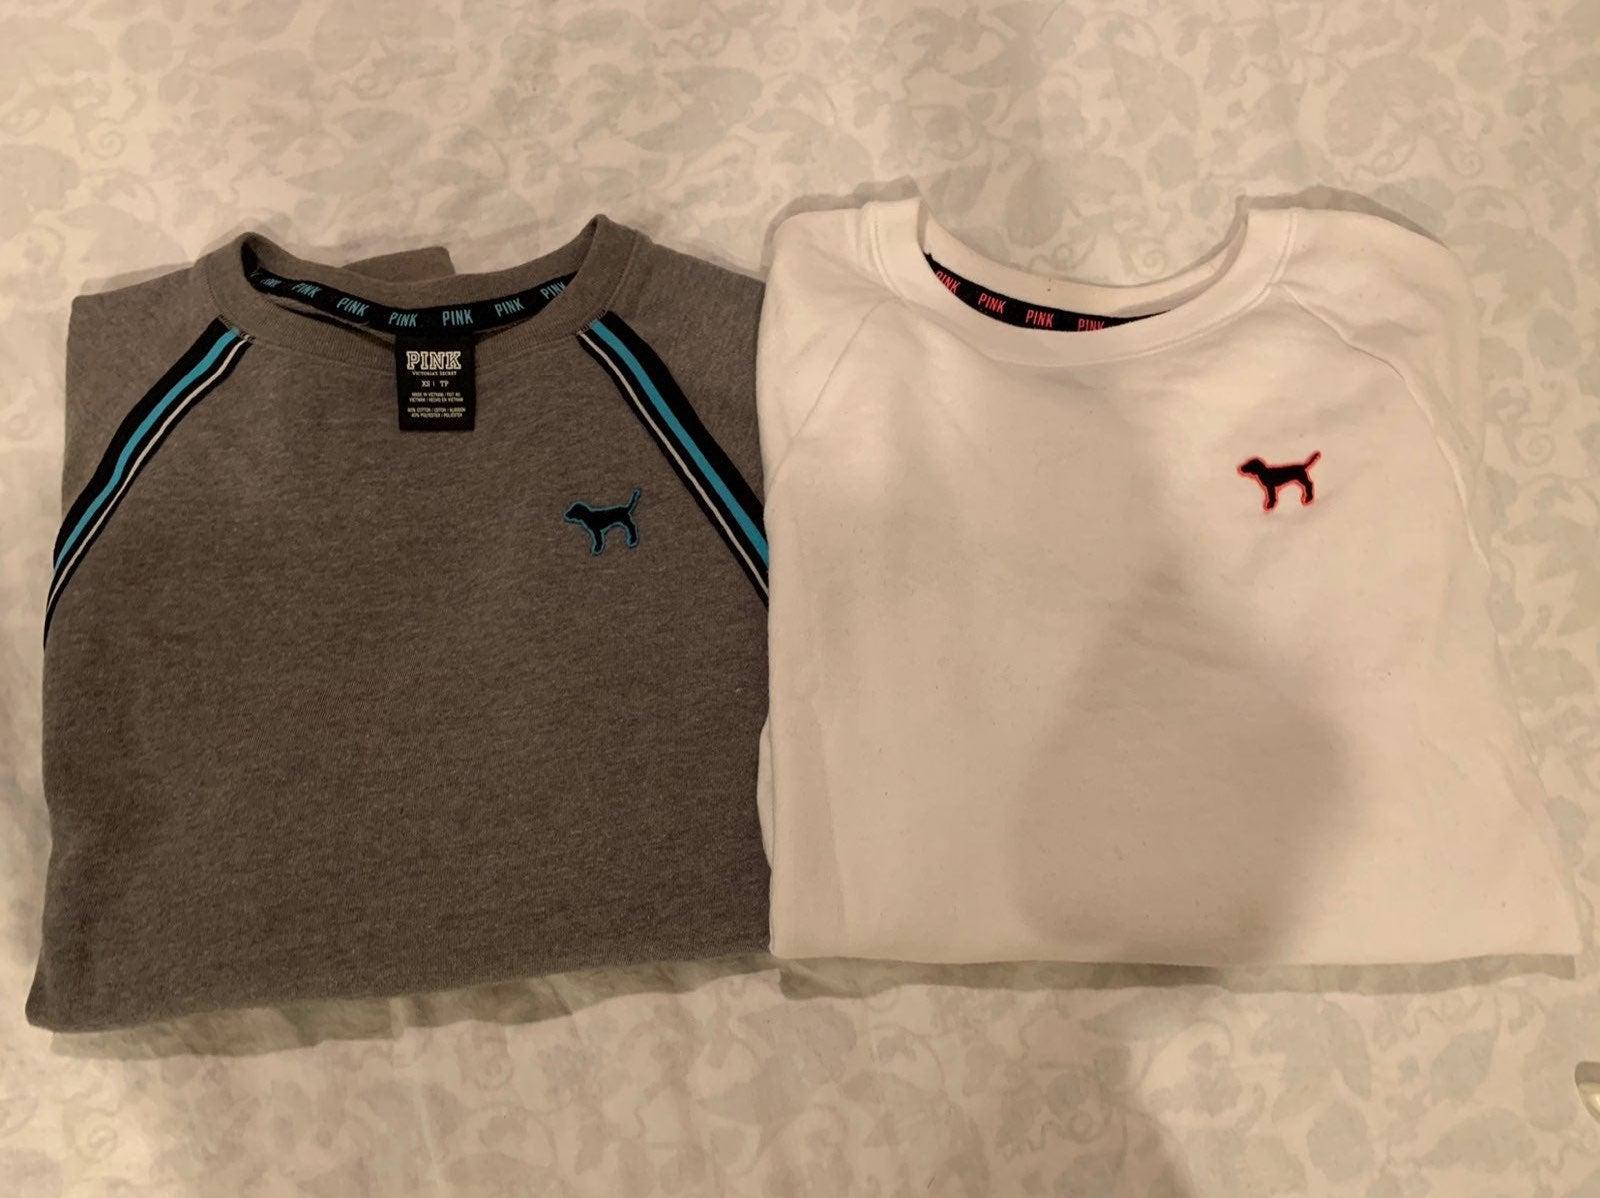 VSPINK Crewneck sweatshirt bundle